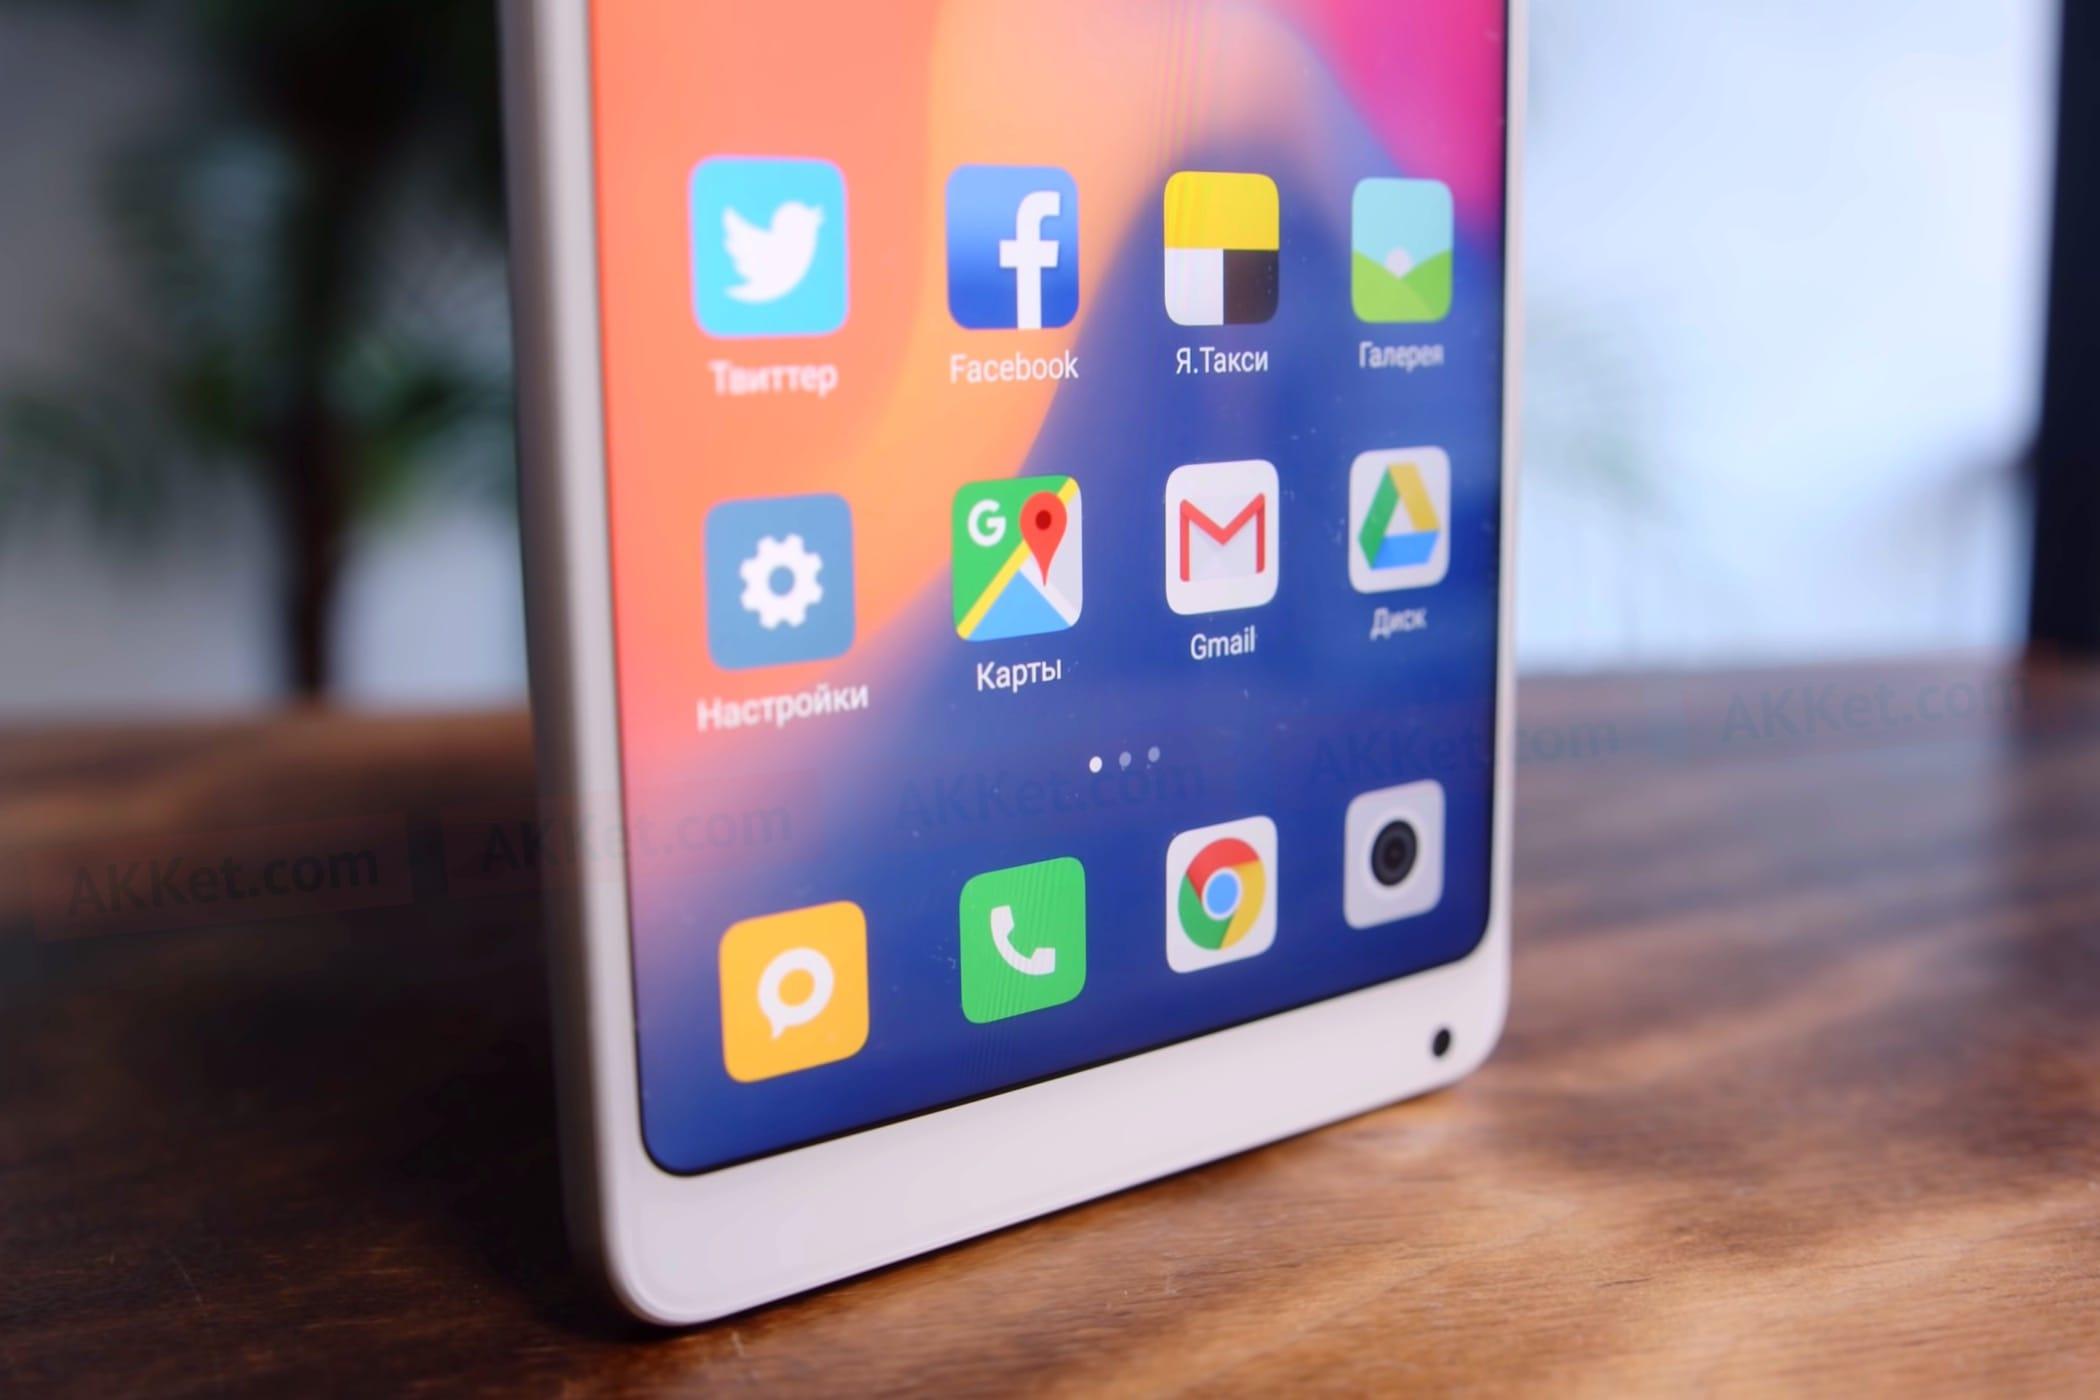 Googliercom Android Search Date 2018 11 05 Nokia Lumia 625 8gb Resmi Orange Xiaomi